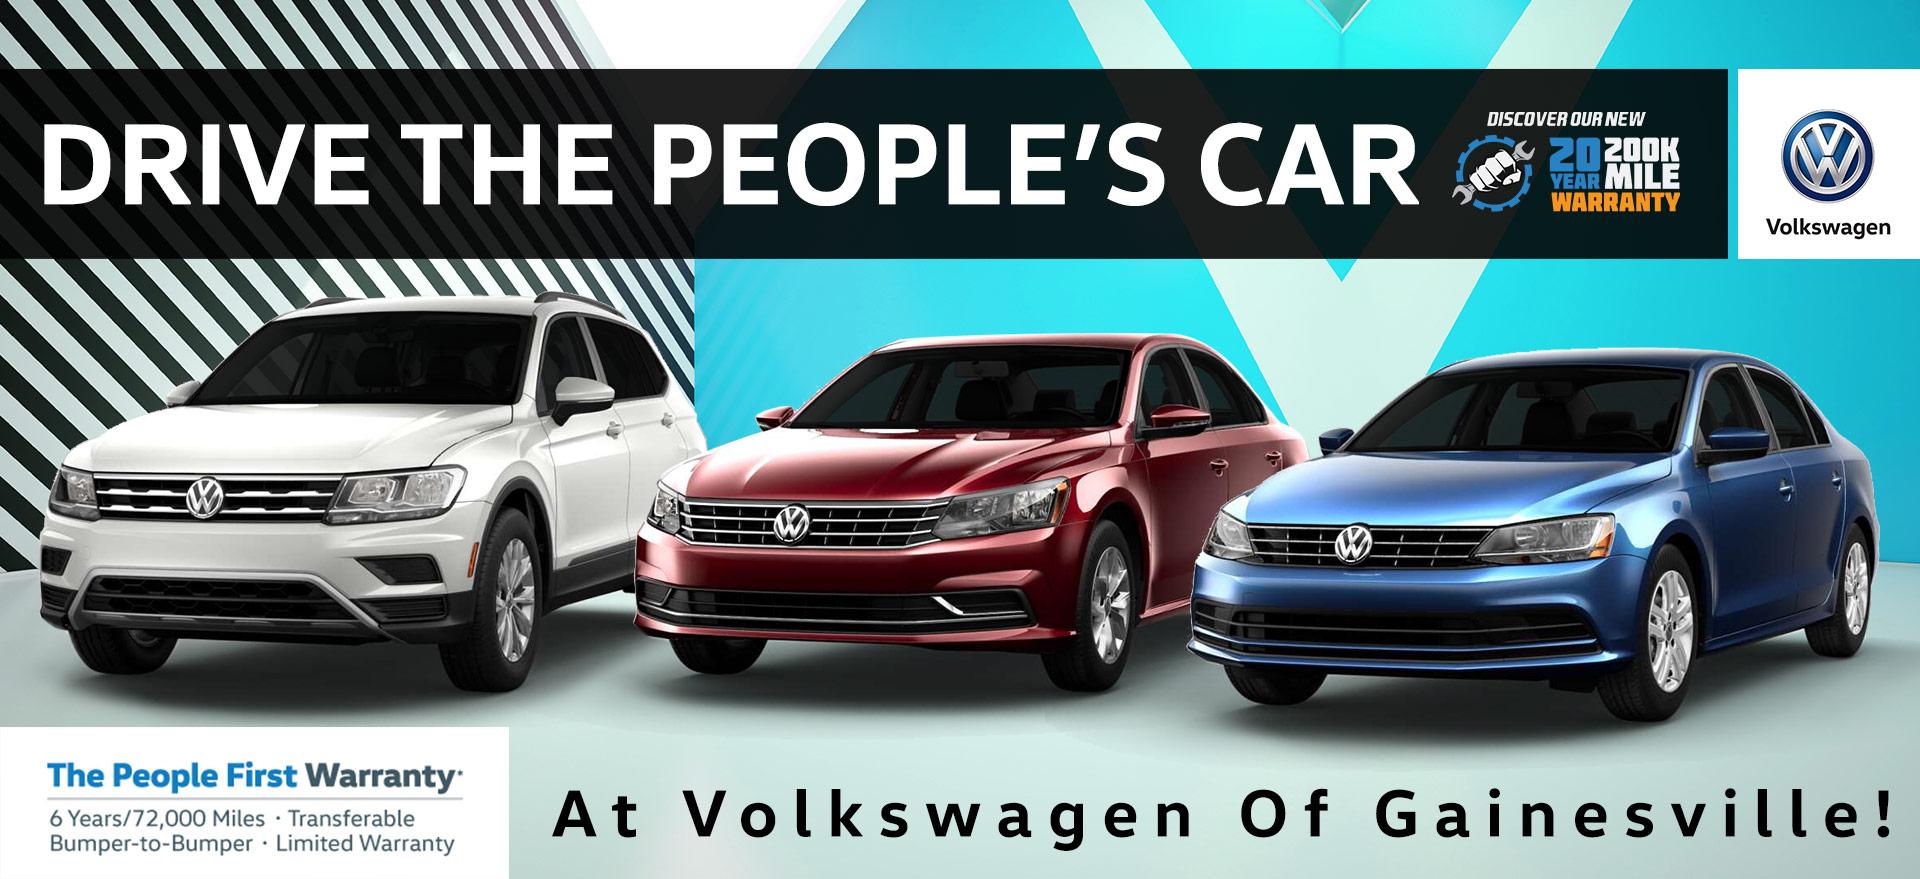 Save Green This Month! | Volkswagen of Gainesville